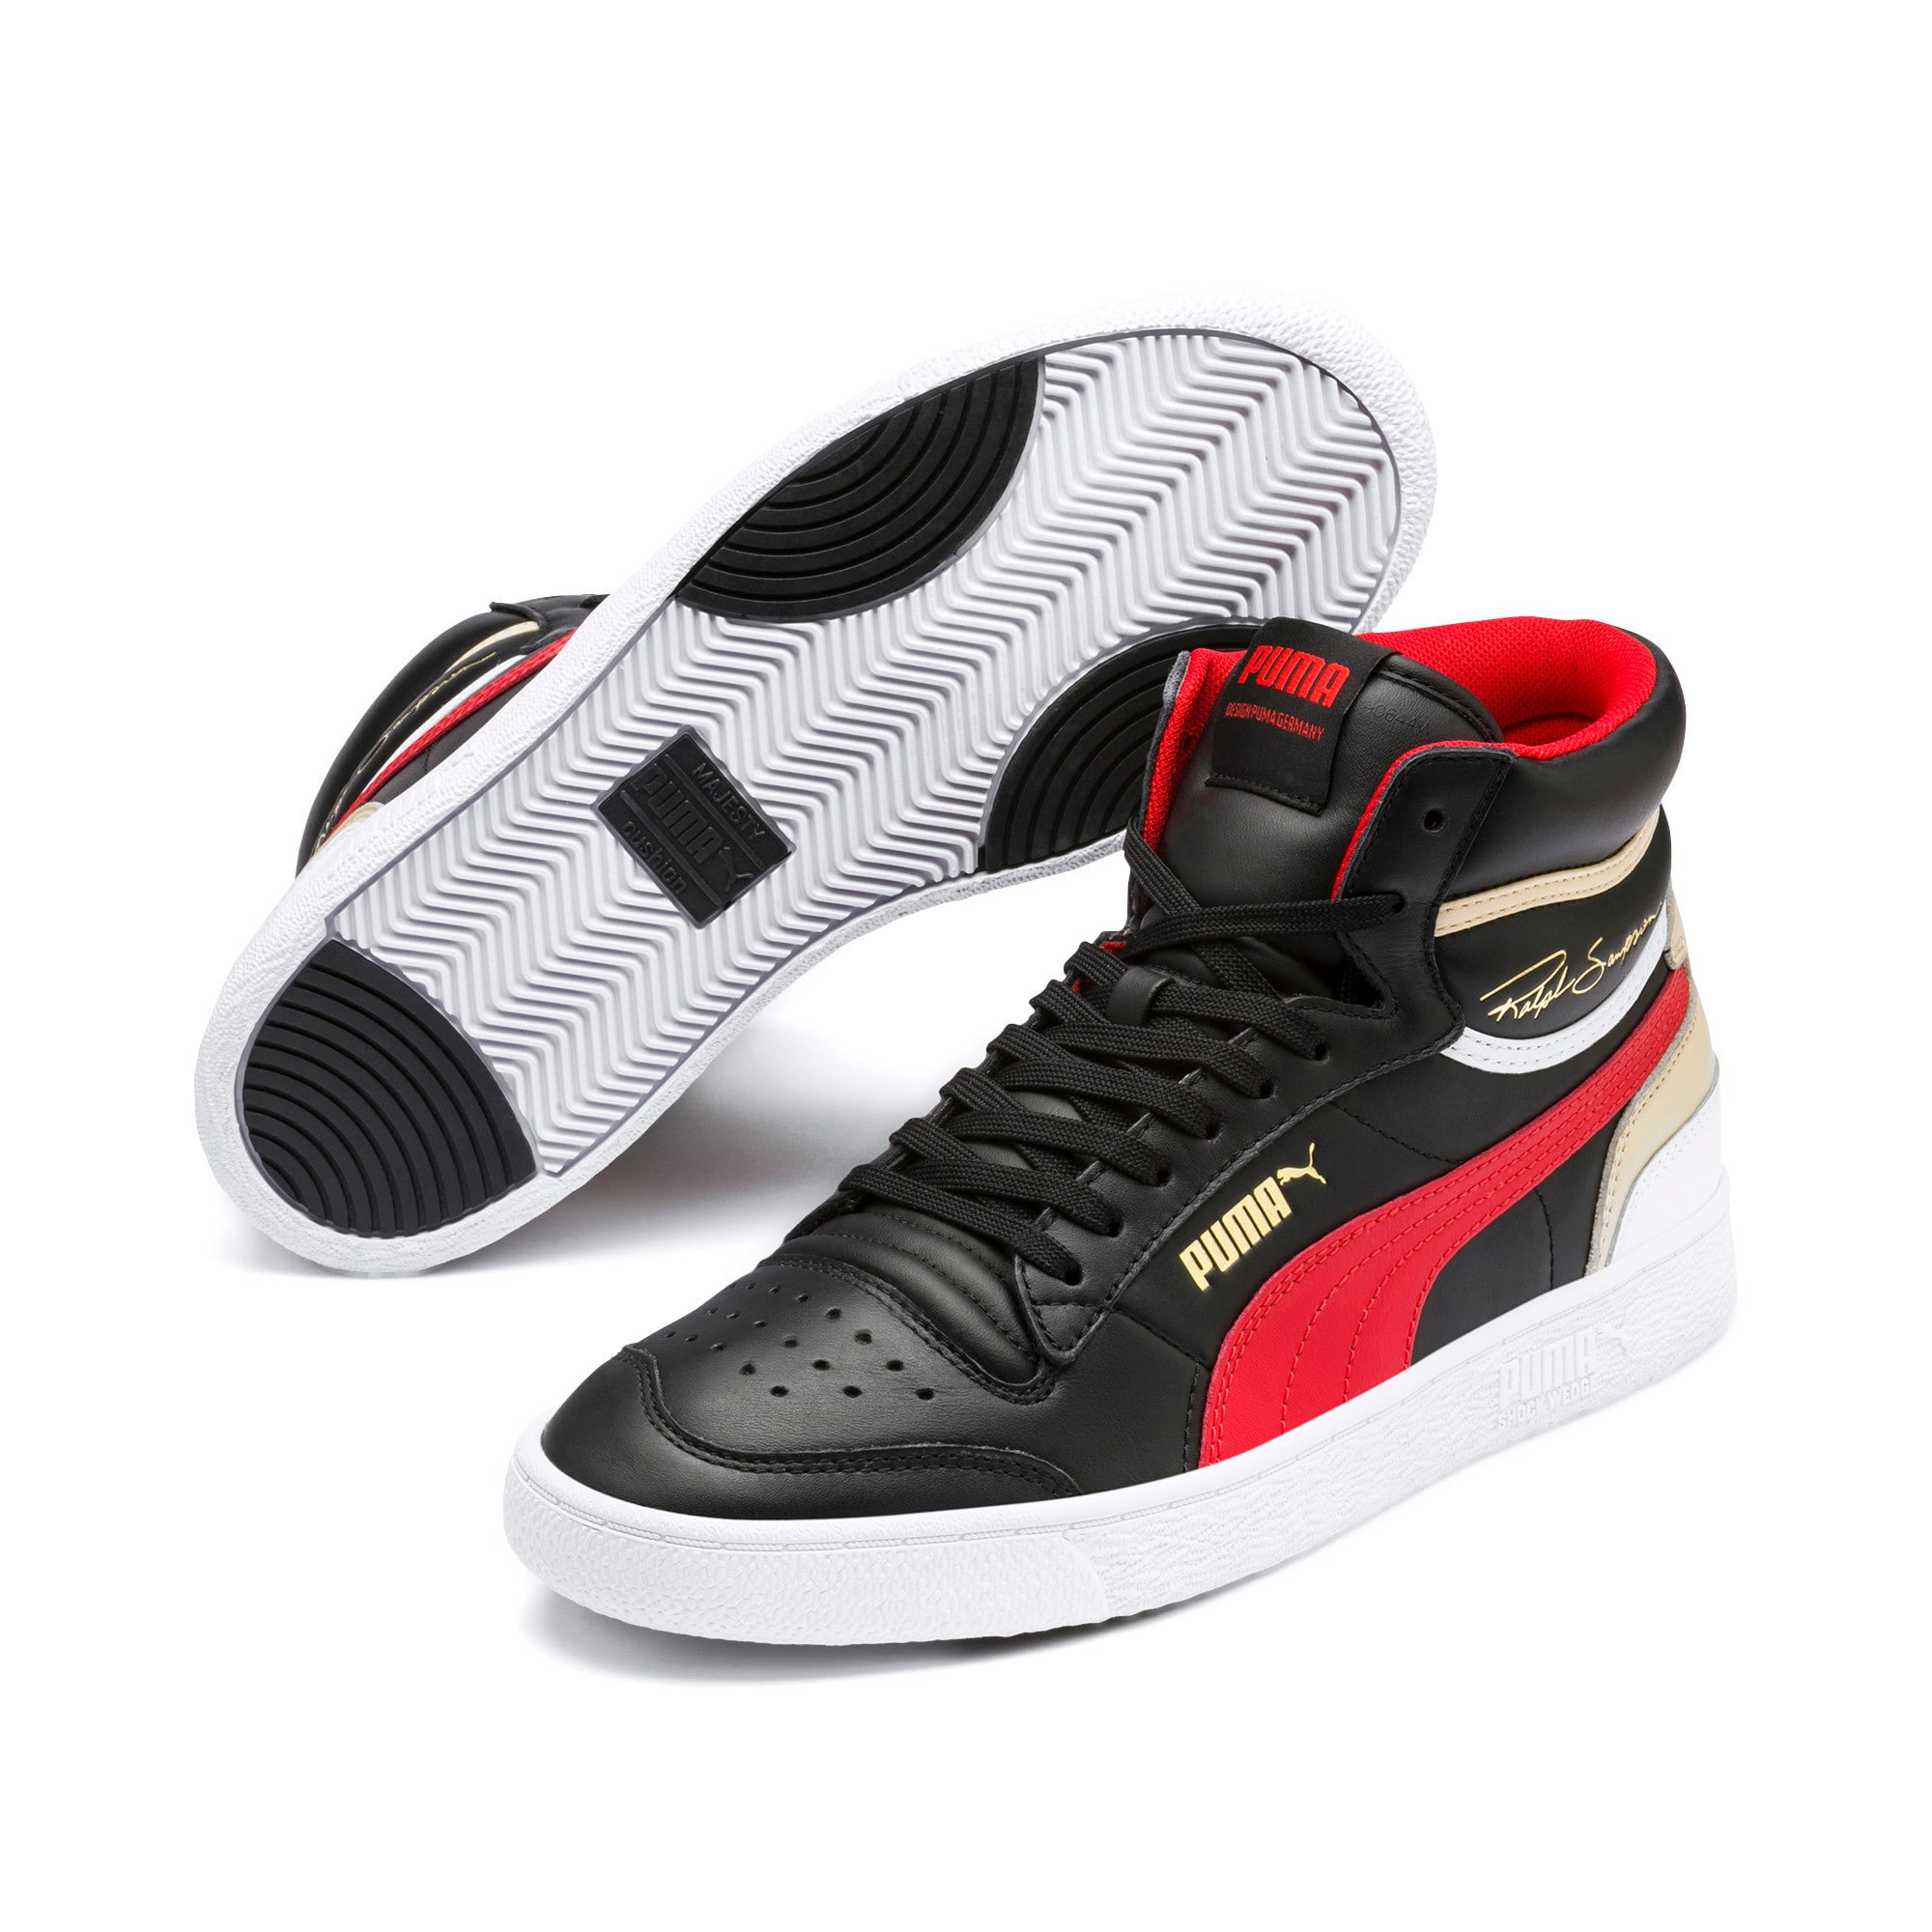 Thumbnail 2 of Ralph Sampson Mid Sneakers, PBlack-High Risk Red-PWhite, medium